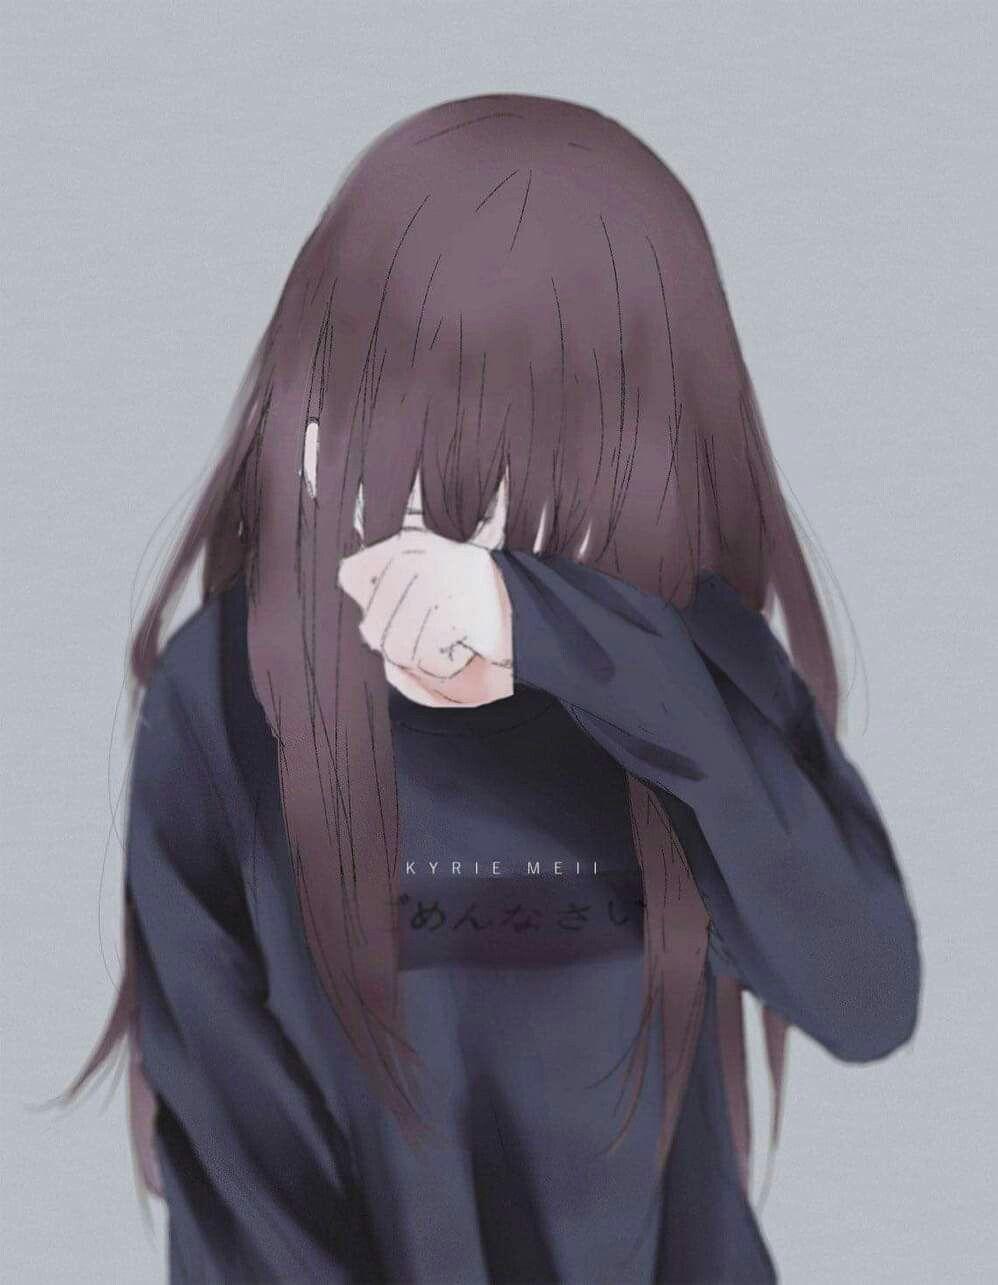 Pin Oleh Vaseena Di Anime Di 2020 Ilustrasi Orang Gadis Anime Sedih Gadis Animasi